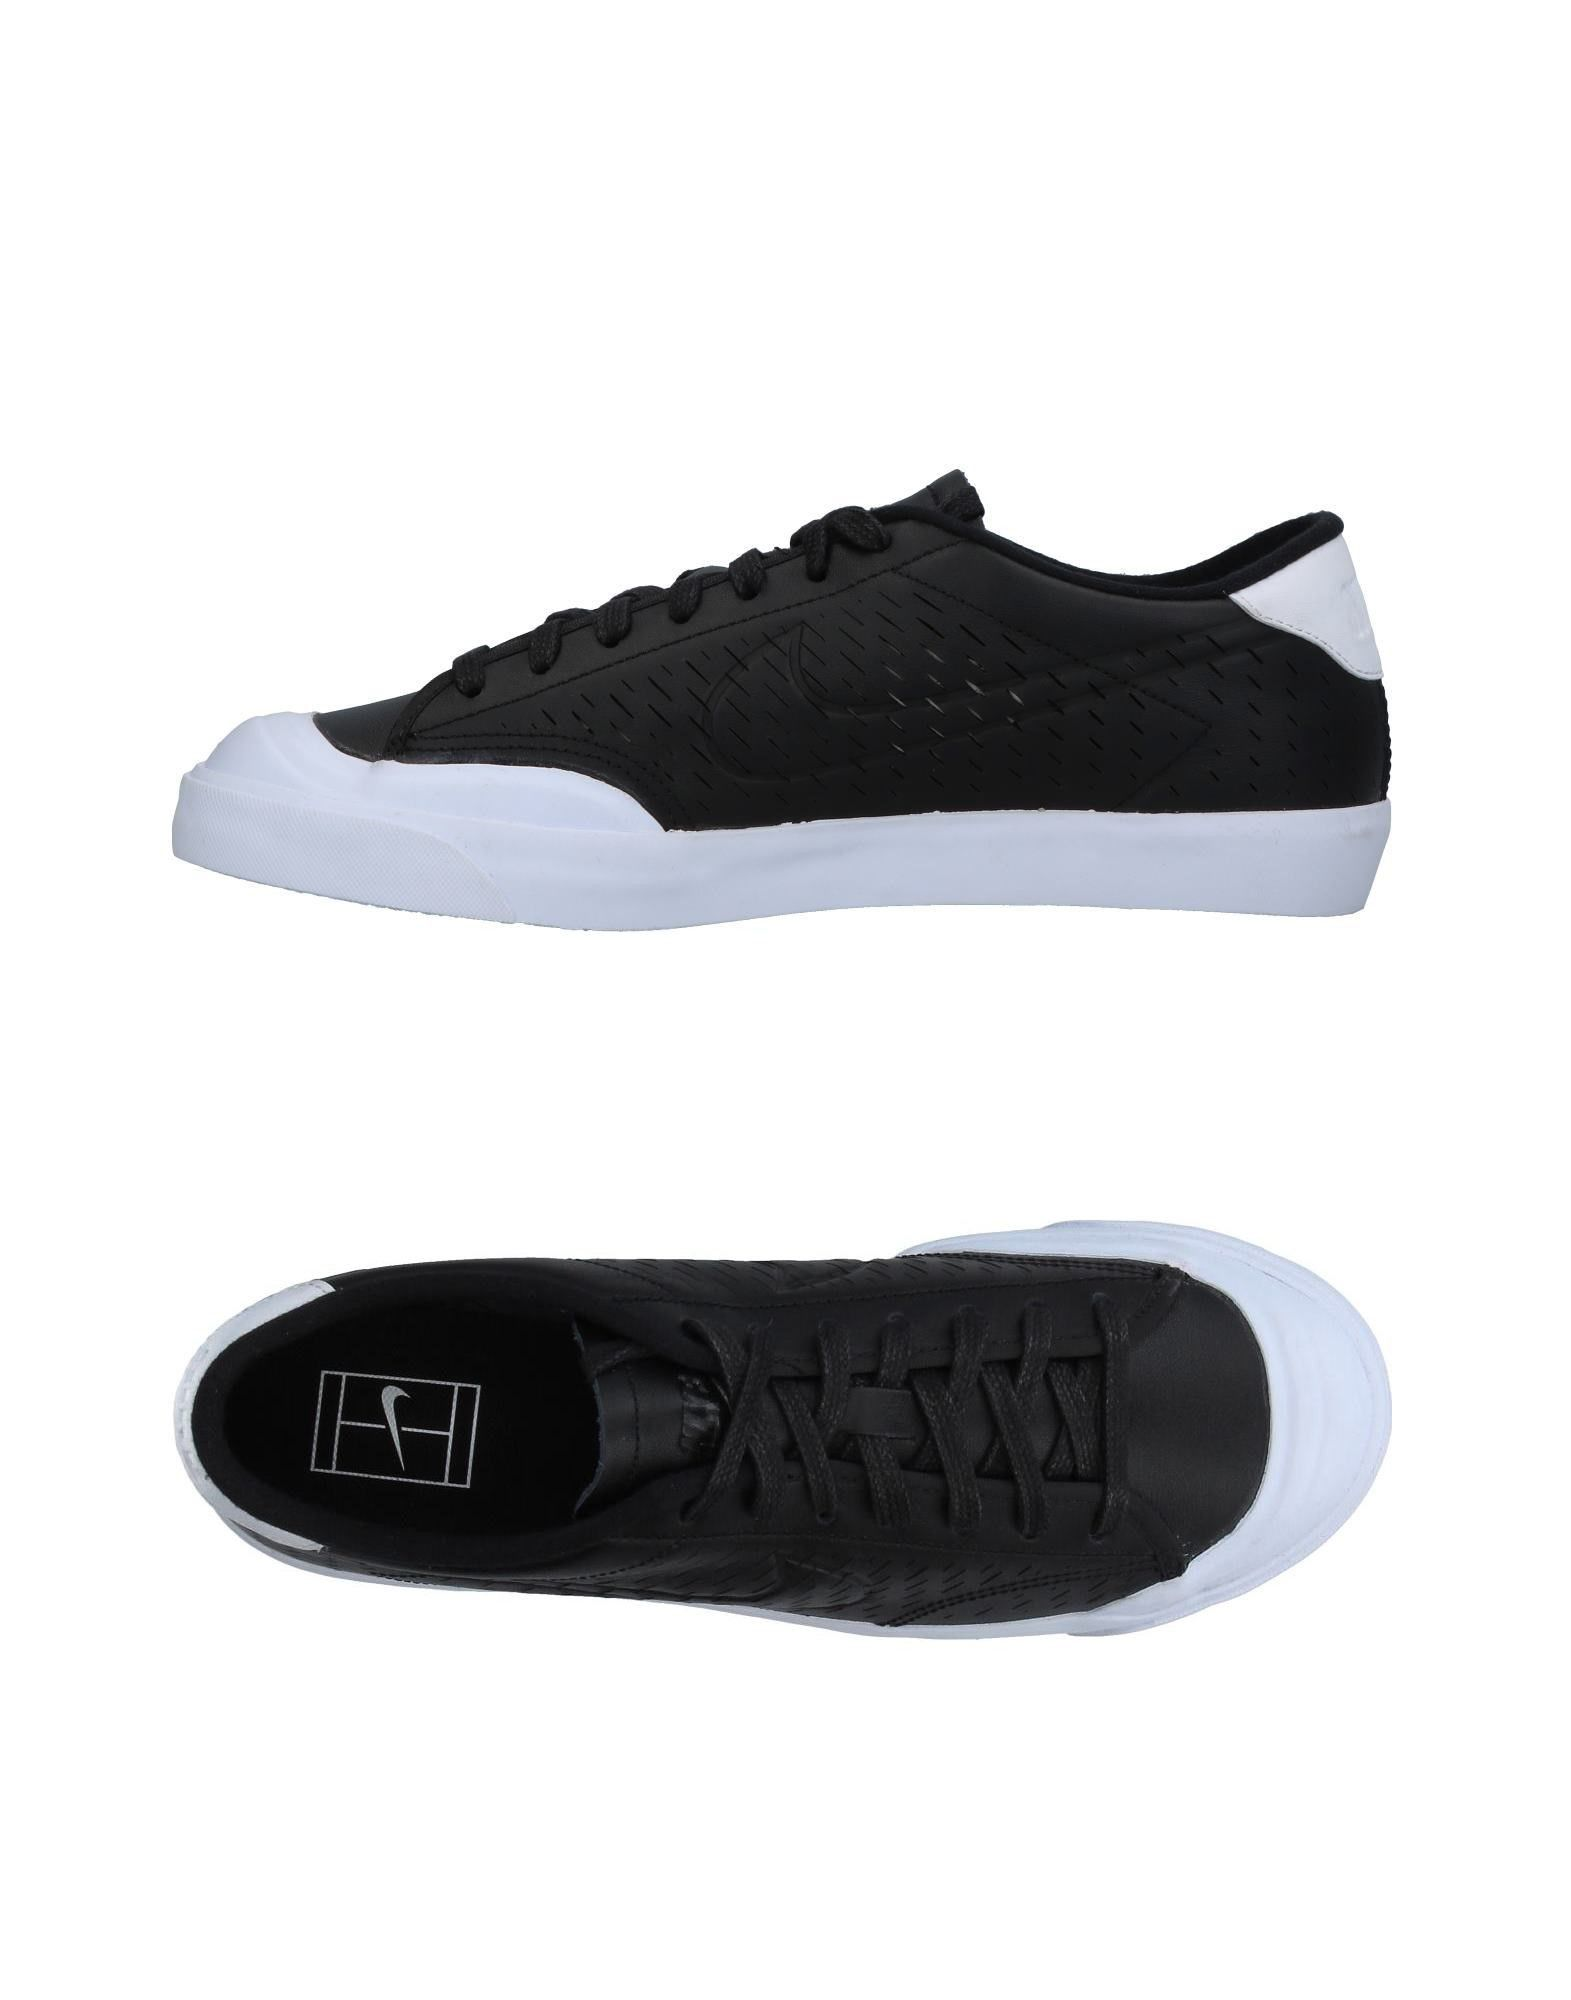 NIKE Herren Low Sneakers & Tennisschuhe Farbe Schwarz Größe 9 jetztbilligerkaufen